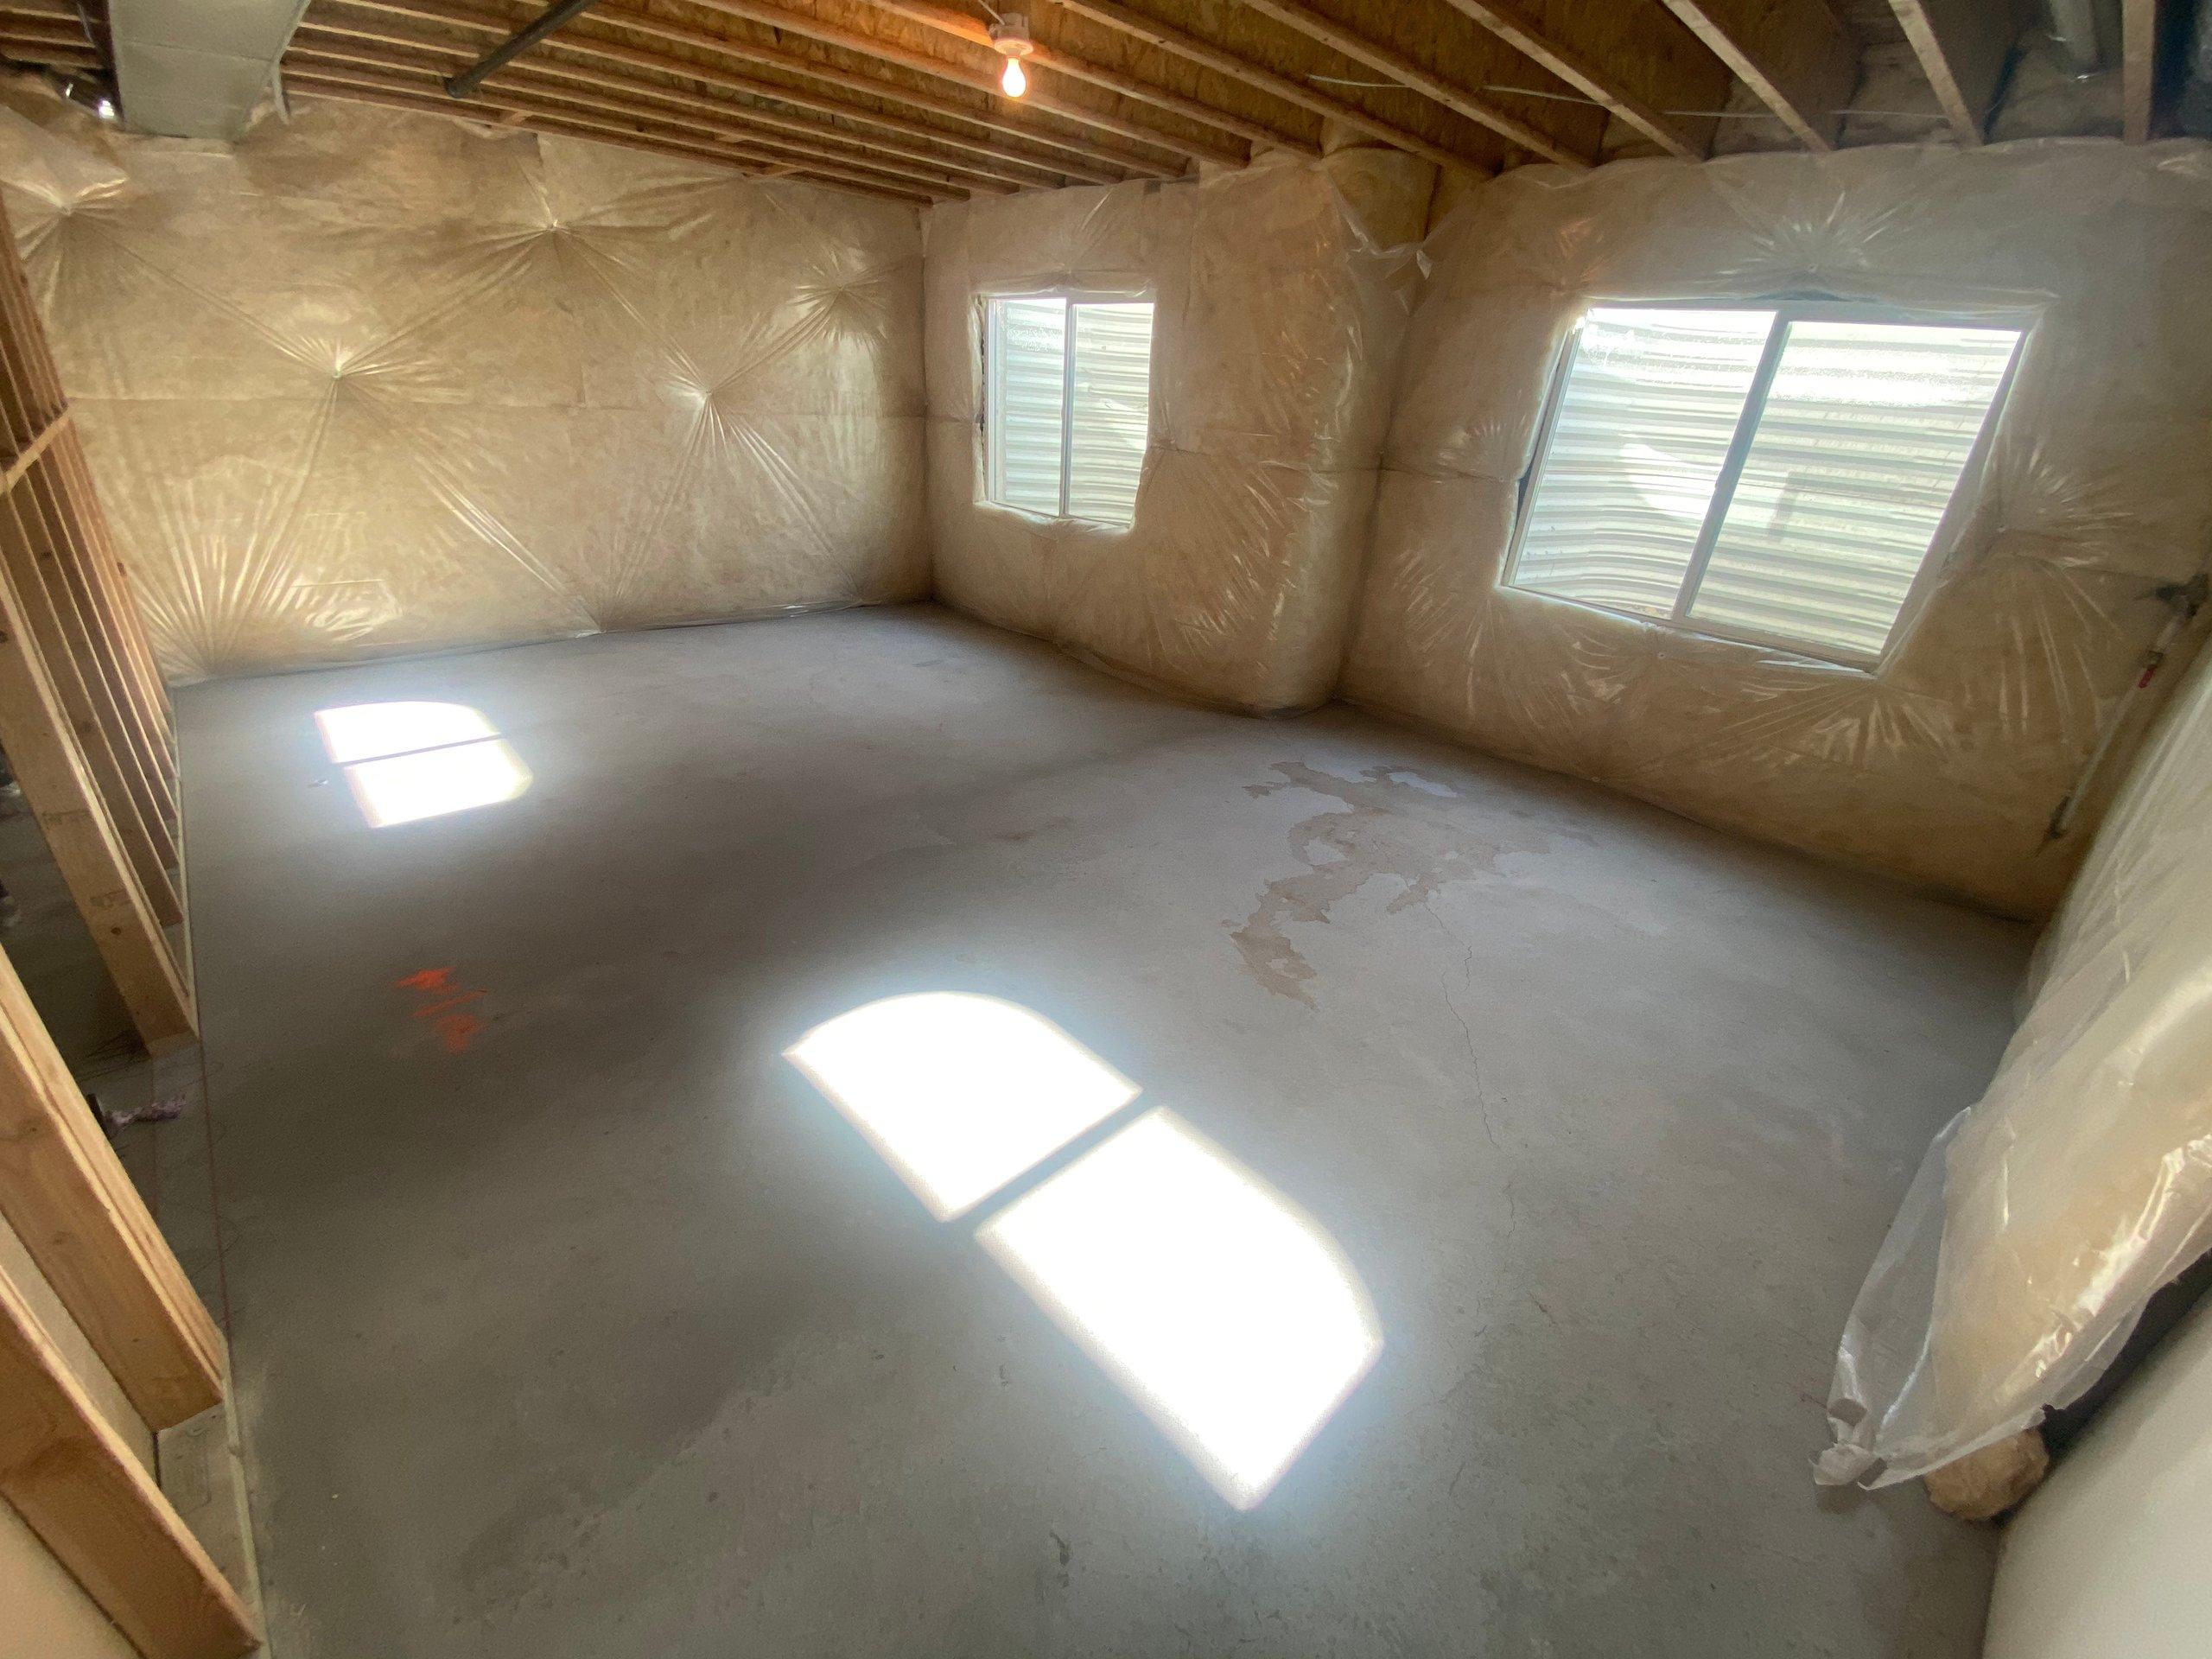 15x12 Basement self storage unit